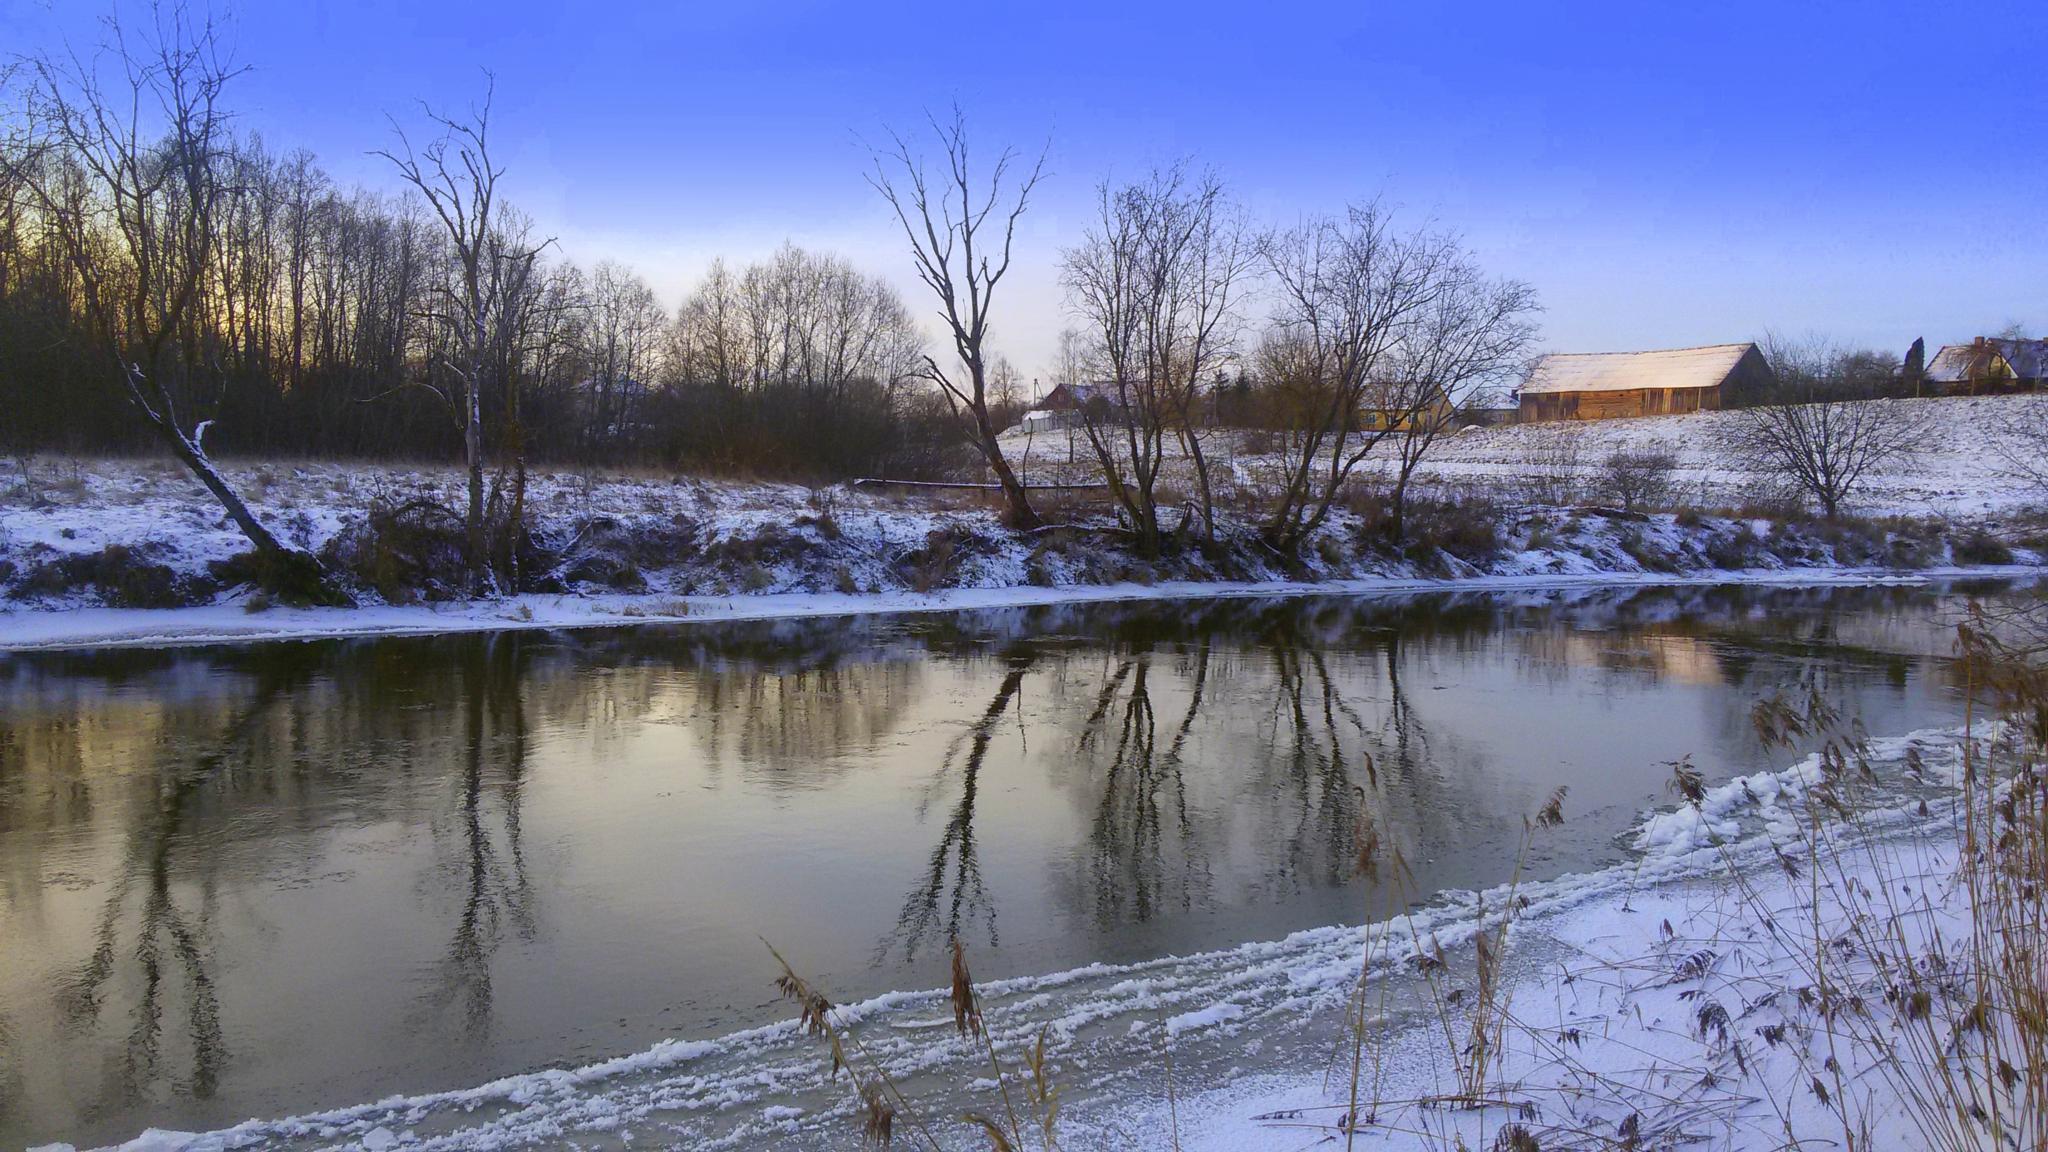 By the river by Zita Užkuraitienė